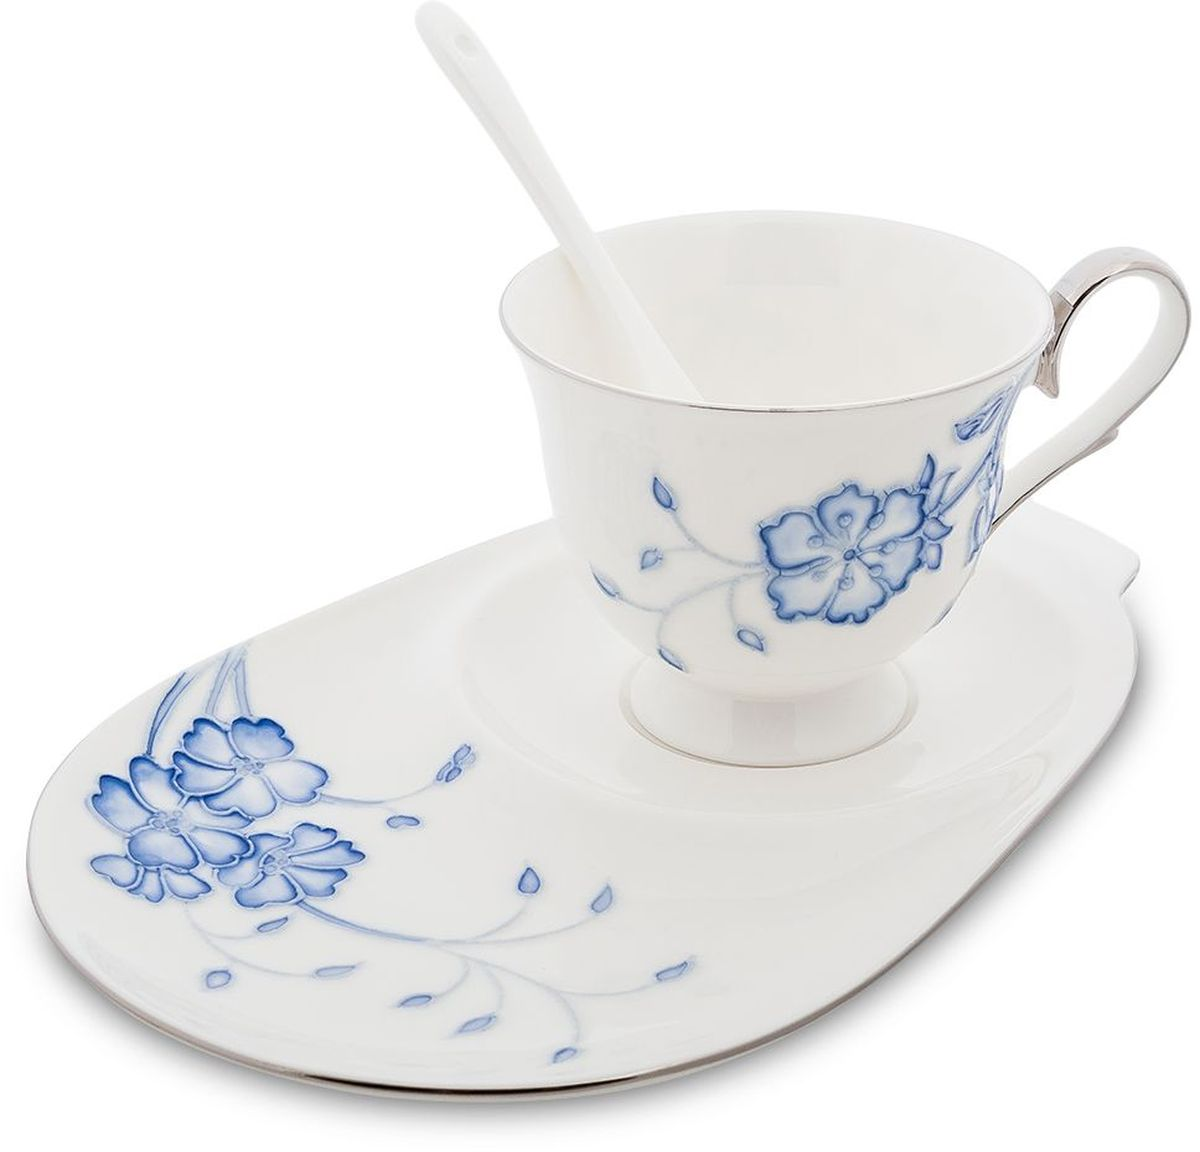 Чайная пара Pavone Голубая бабочка, 3 предмета. 451606451606Объем чашки: 250 мл Длина блюдца: 23 см